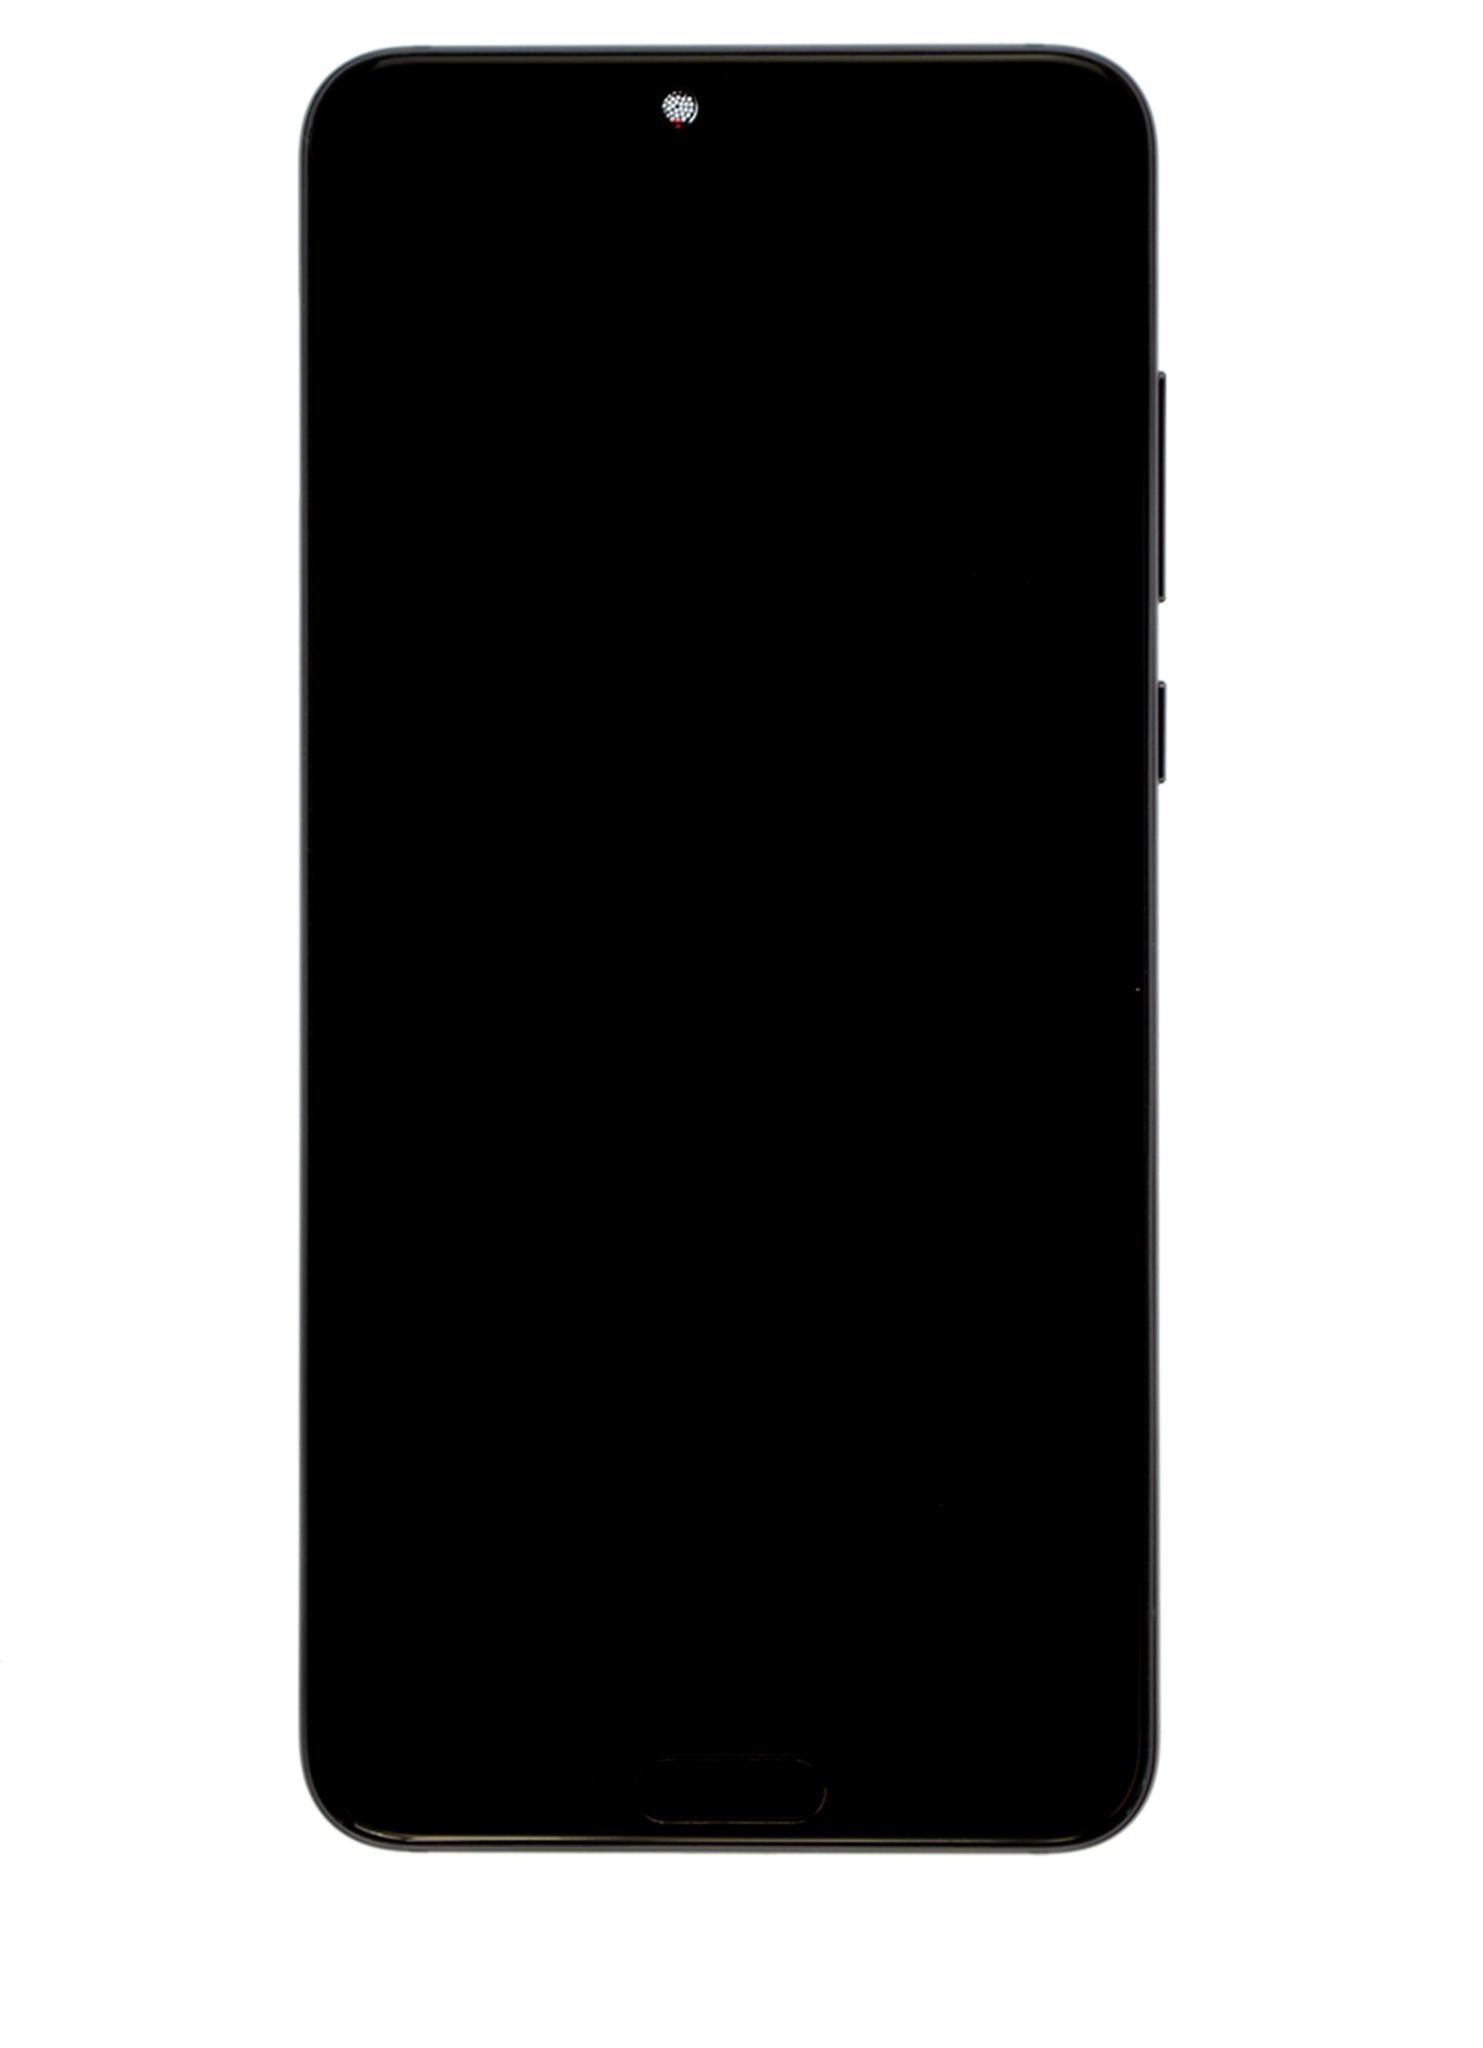 Huawei P20 Pro CLT-L29 Display Module + Frame Blue